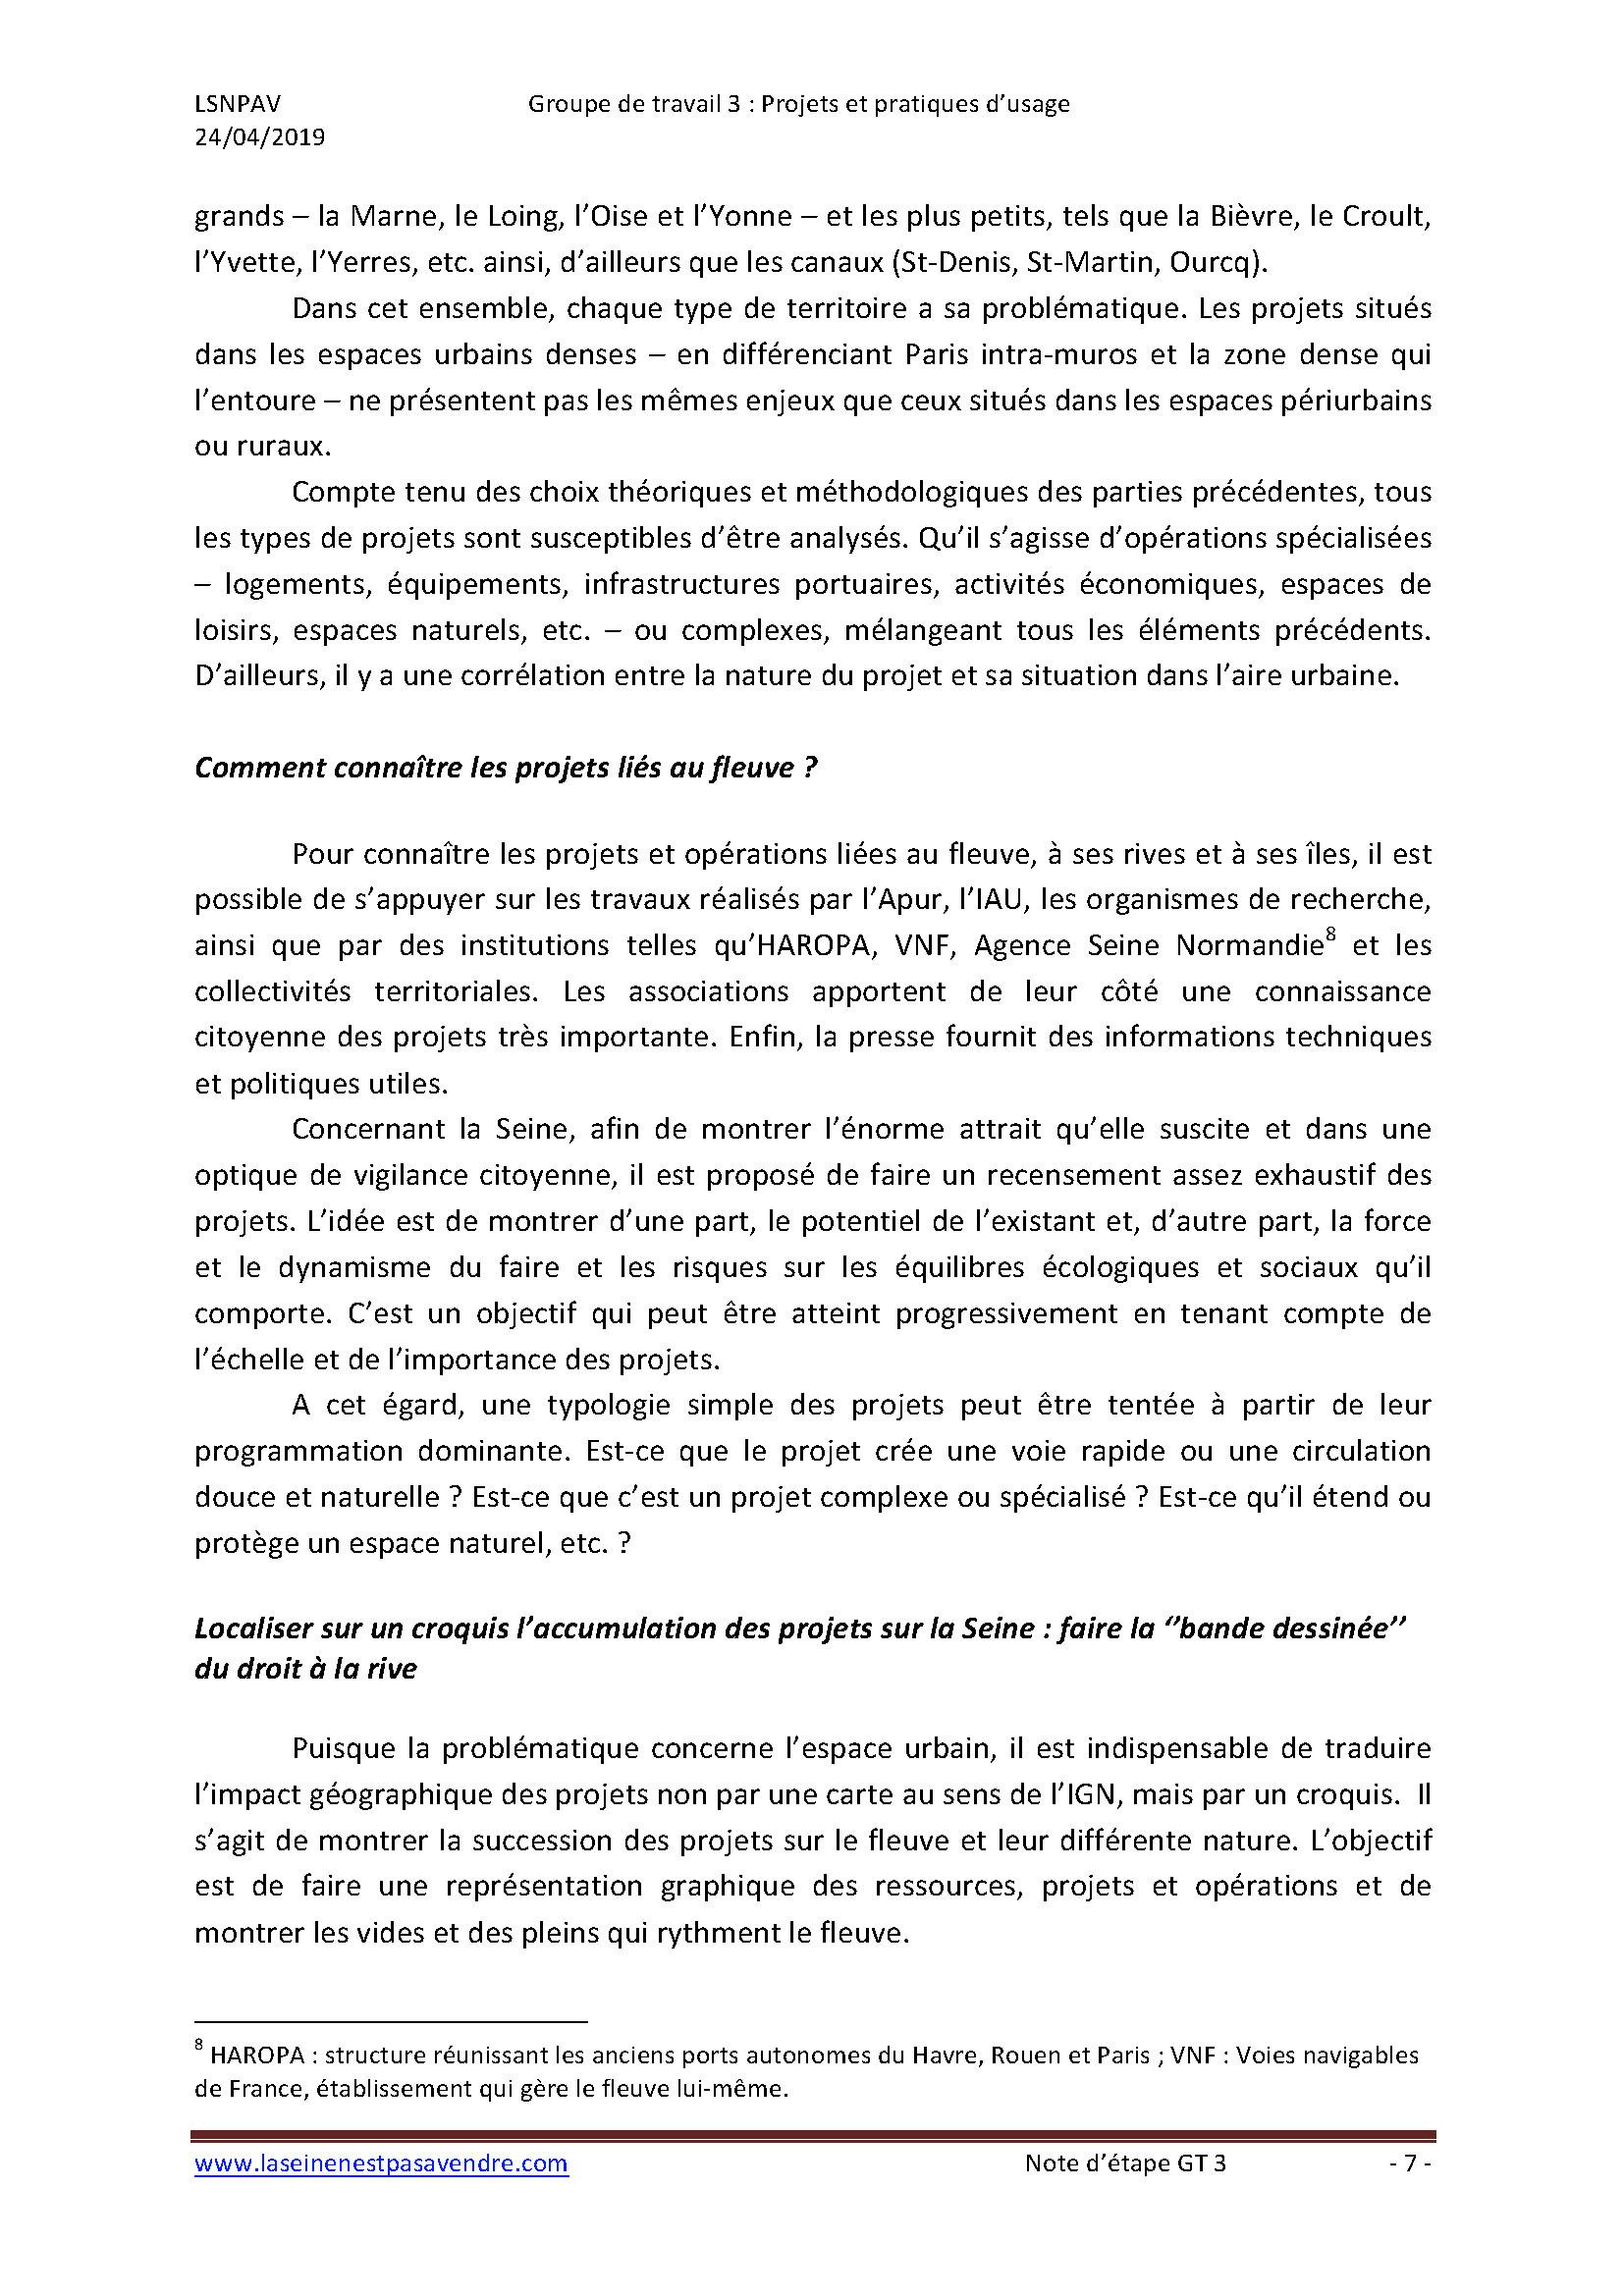 GT 3 Note d'étape_Page_07.jpg